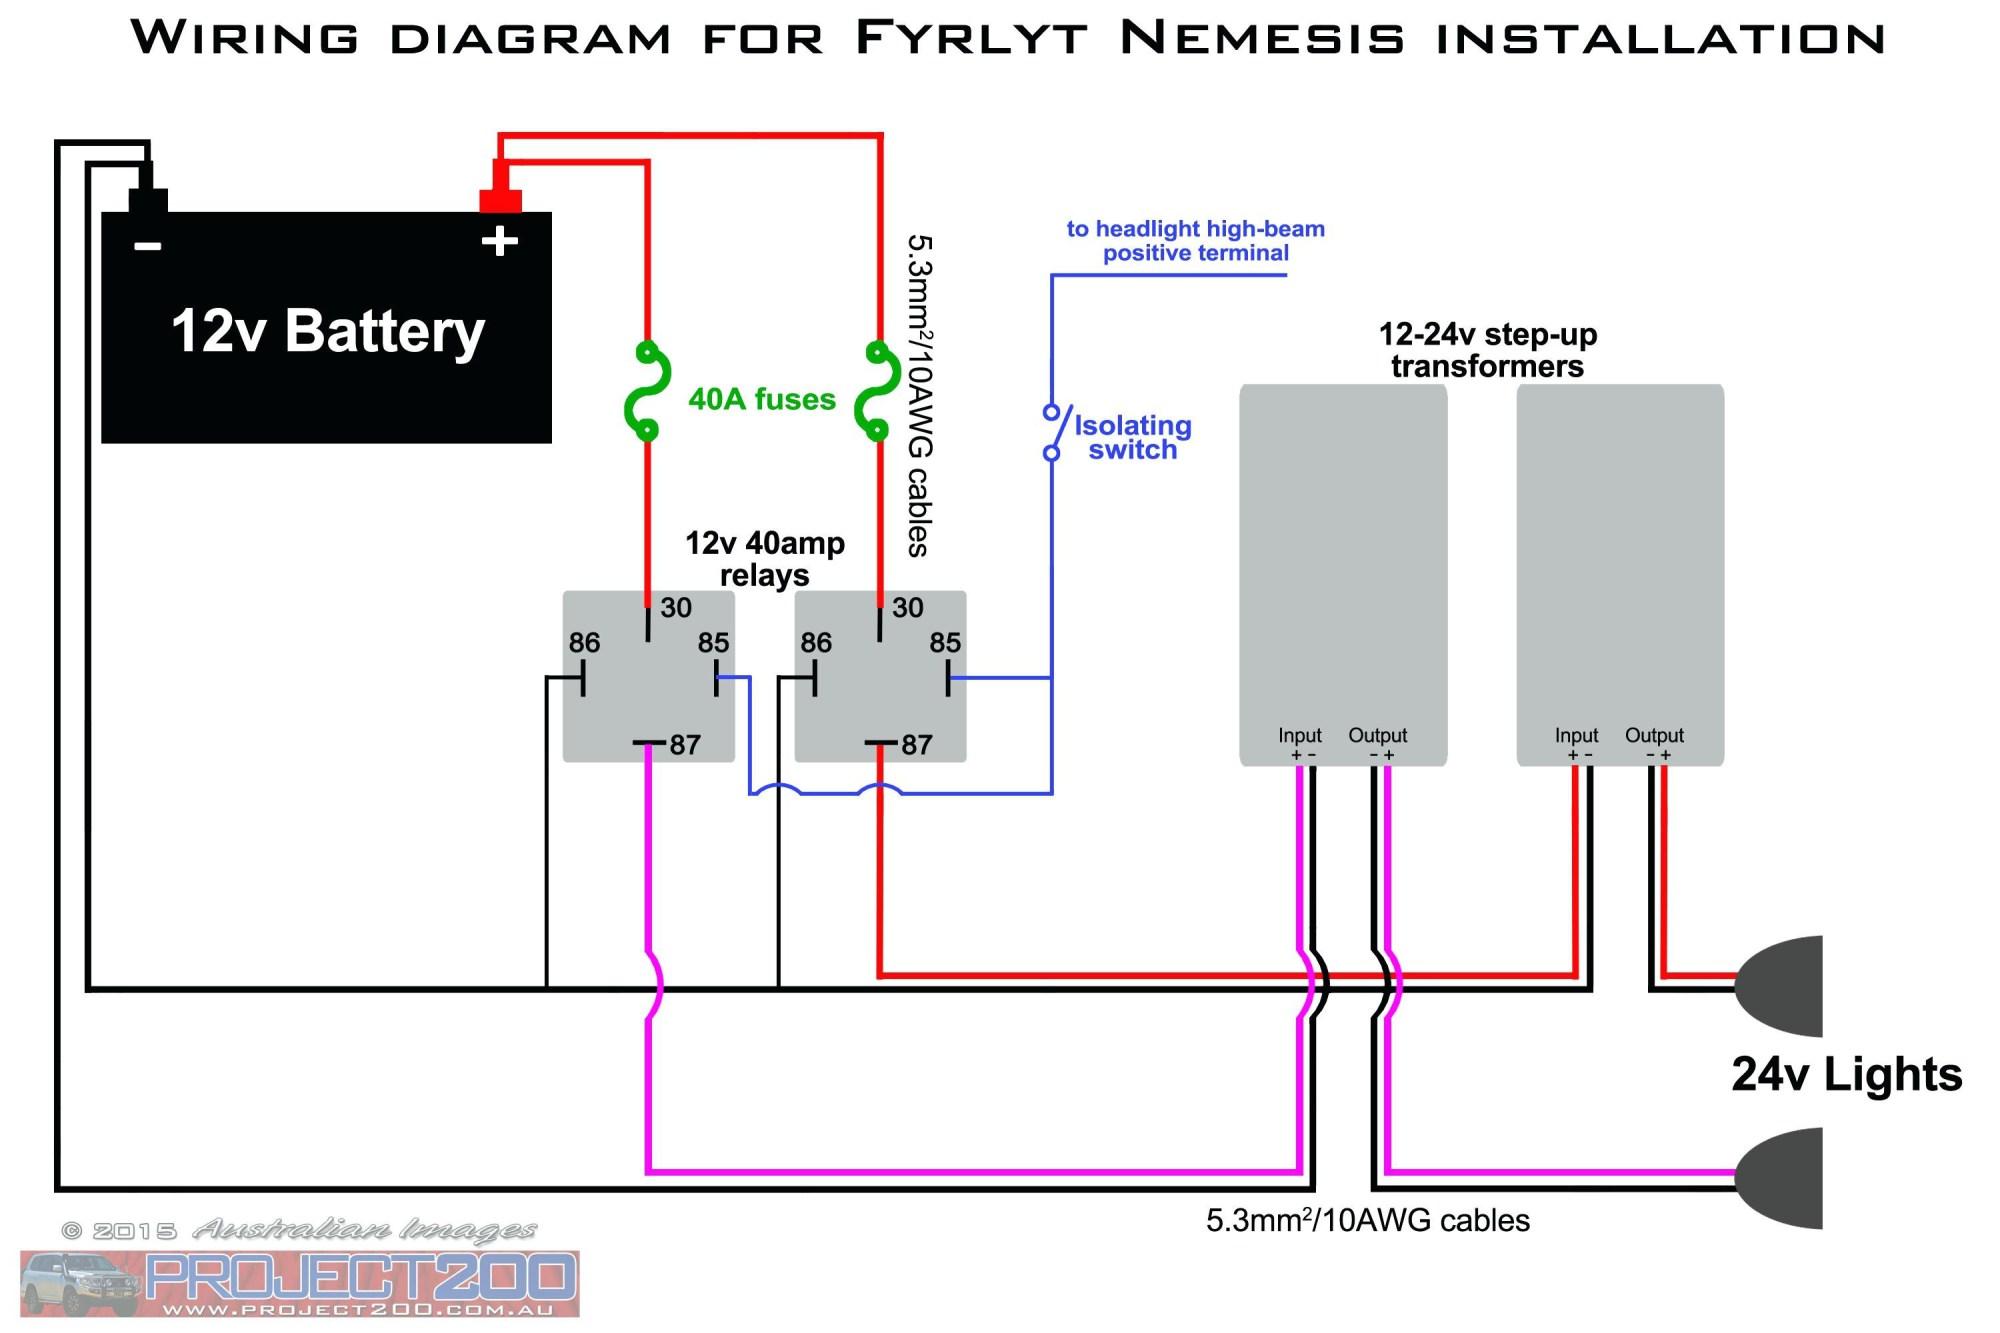 hight resolution of 12v relay wiring diagram spotlights download wiring diagram relay spotlights best 12v switch panel wiring